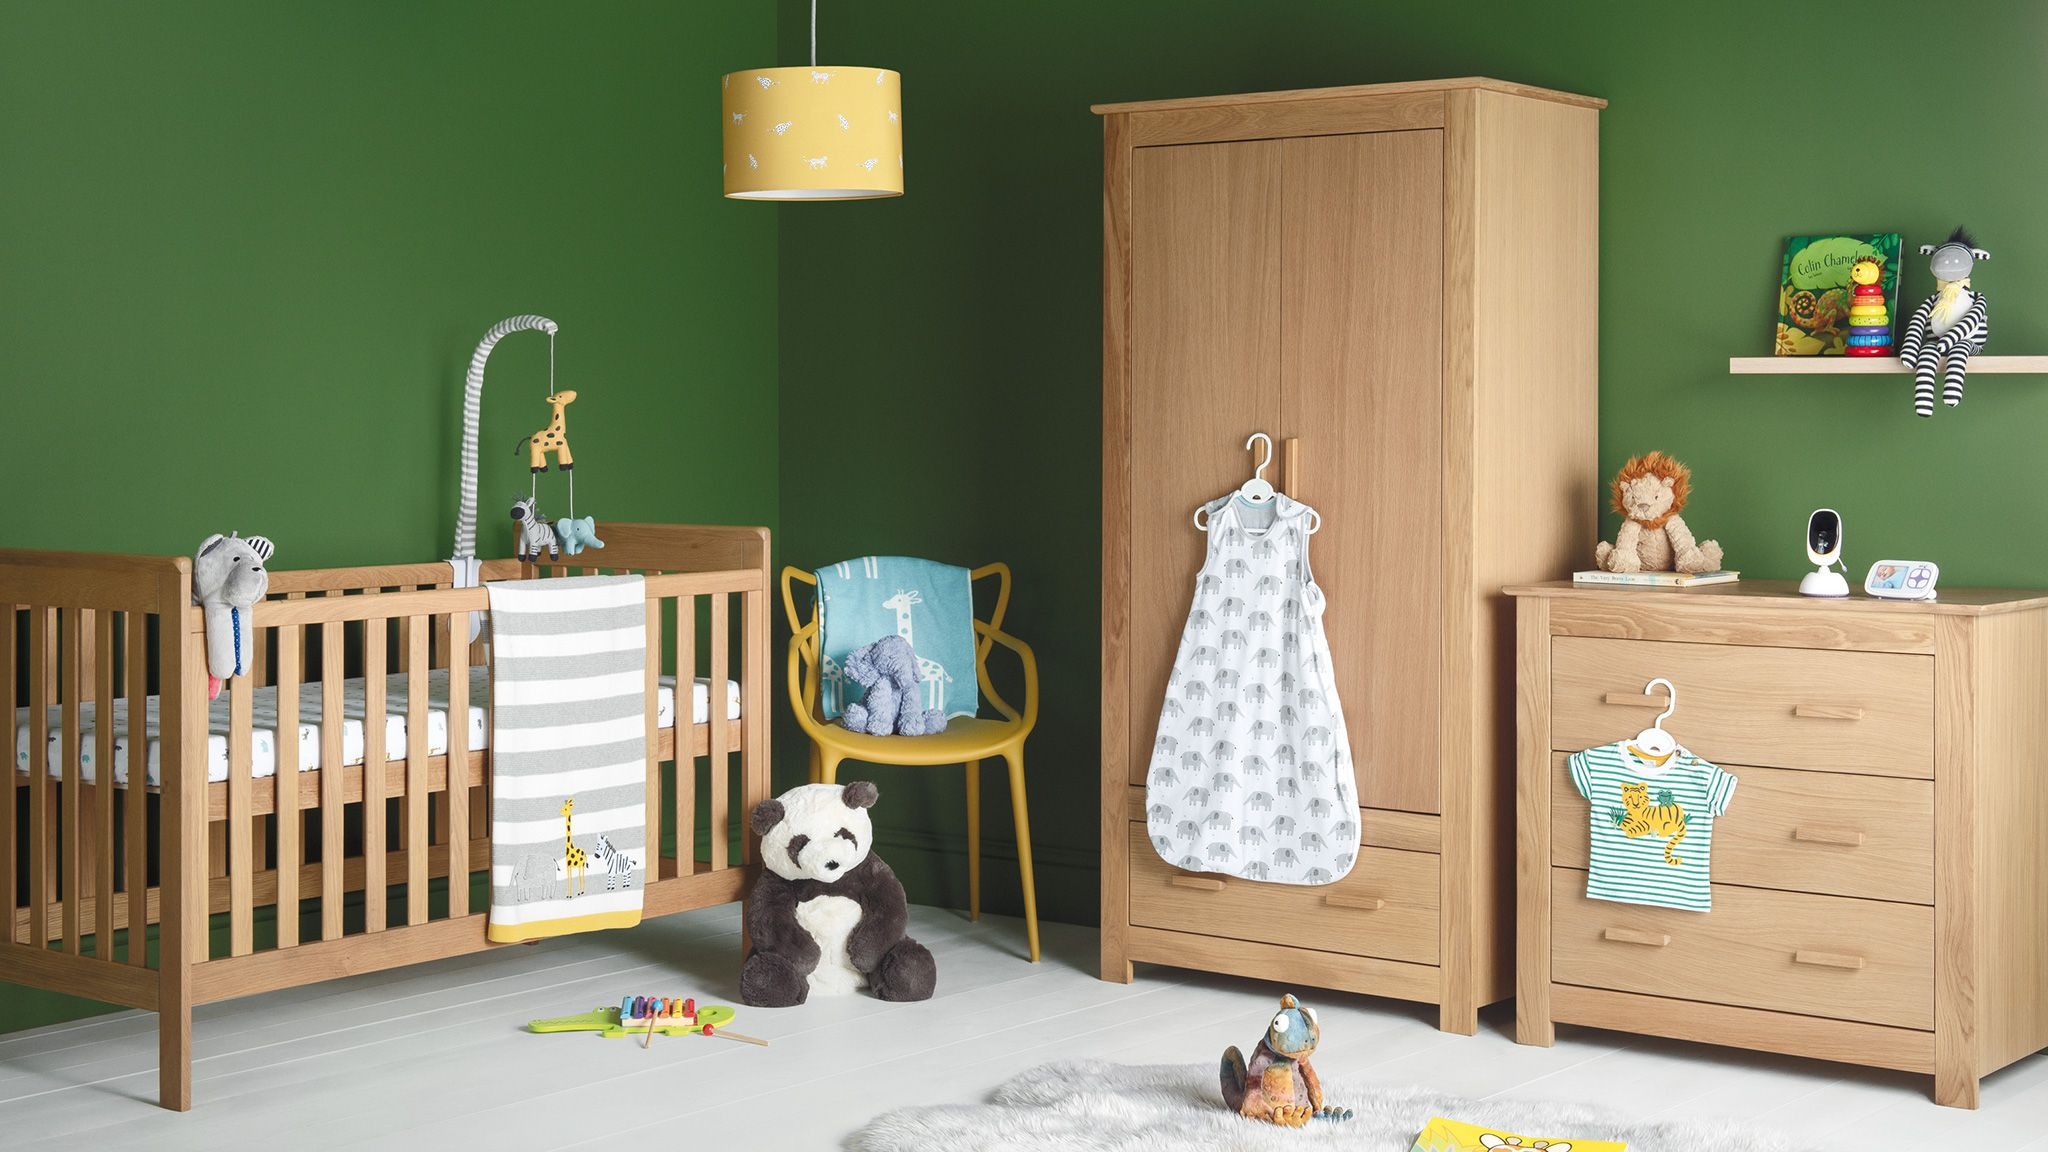 Baby Gifts | Baby Shower & Christening